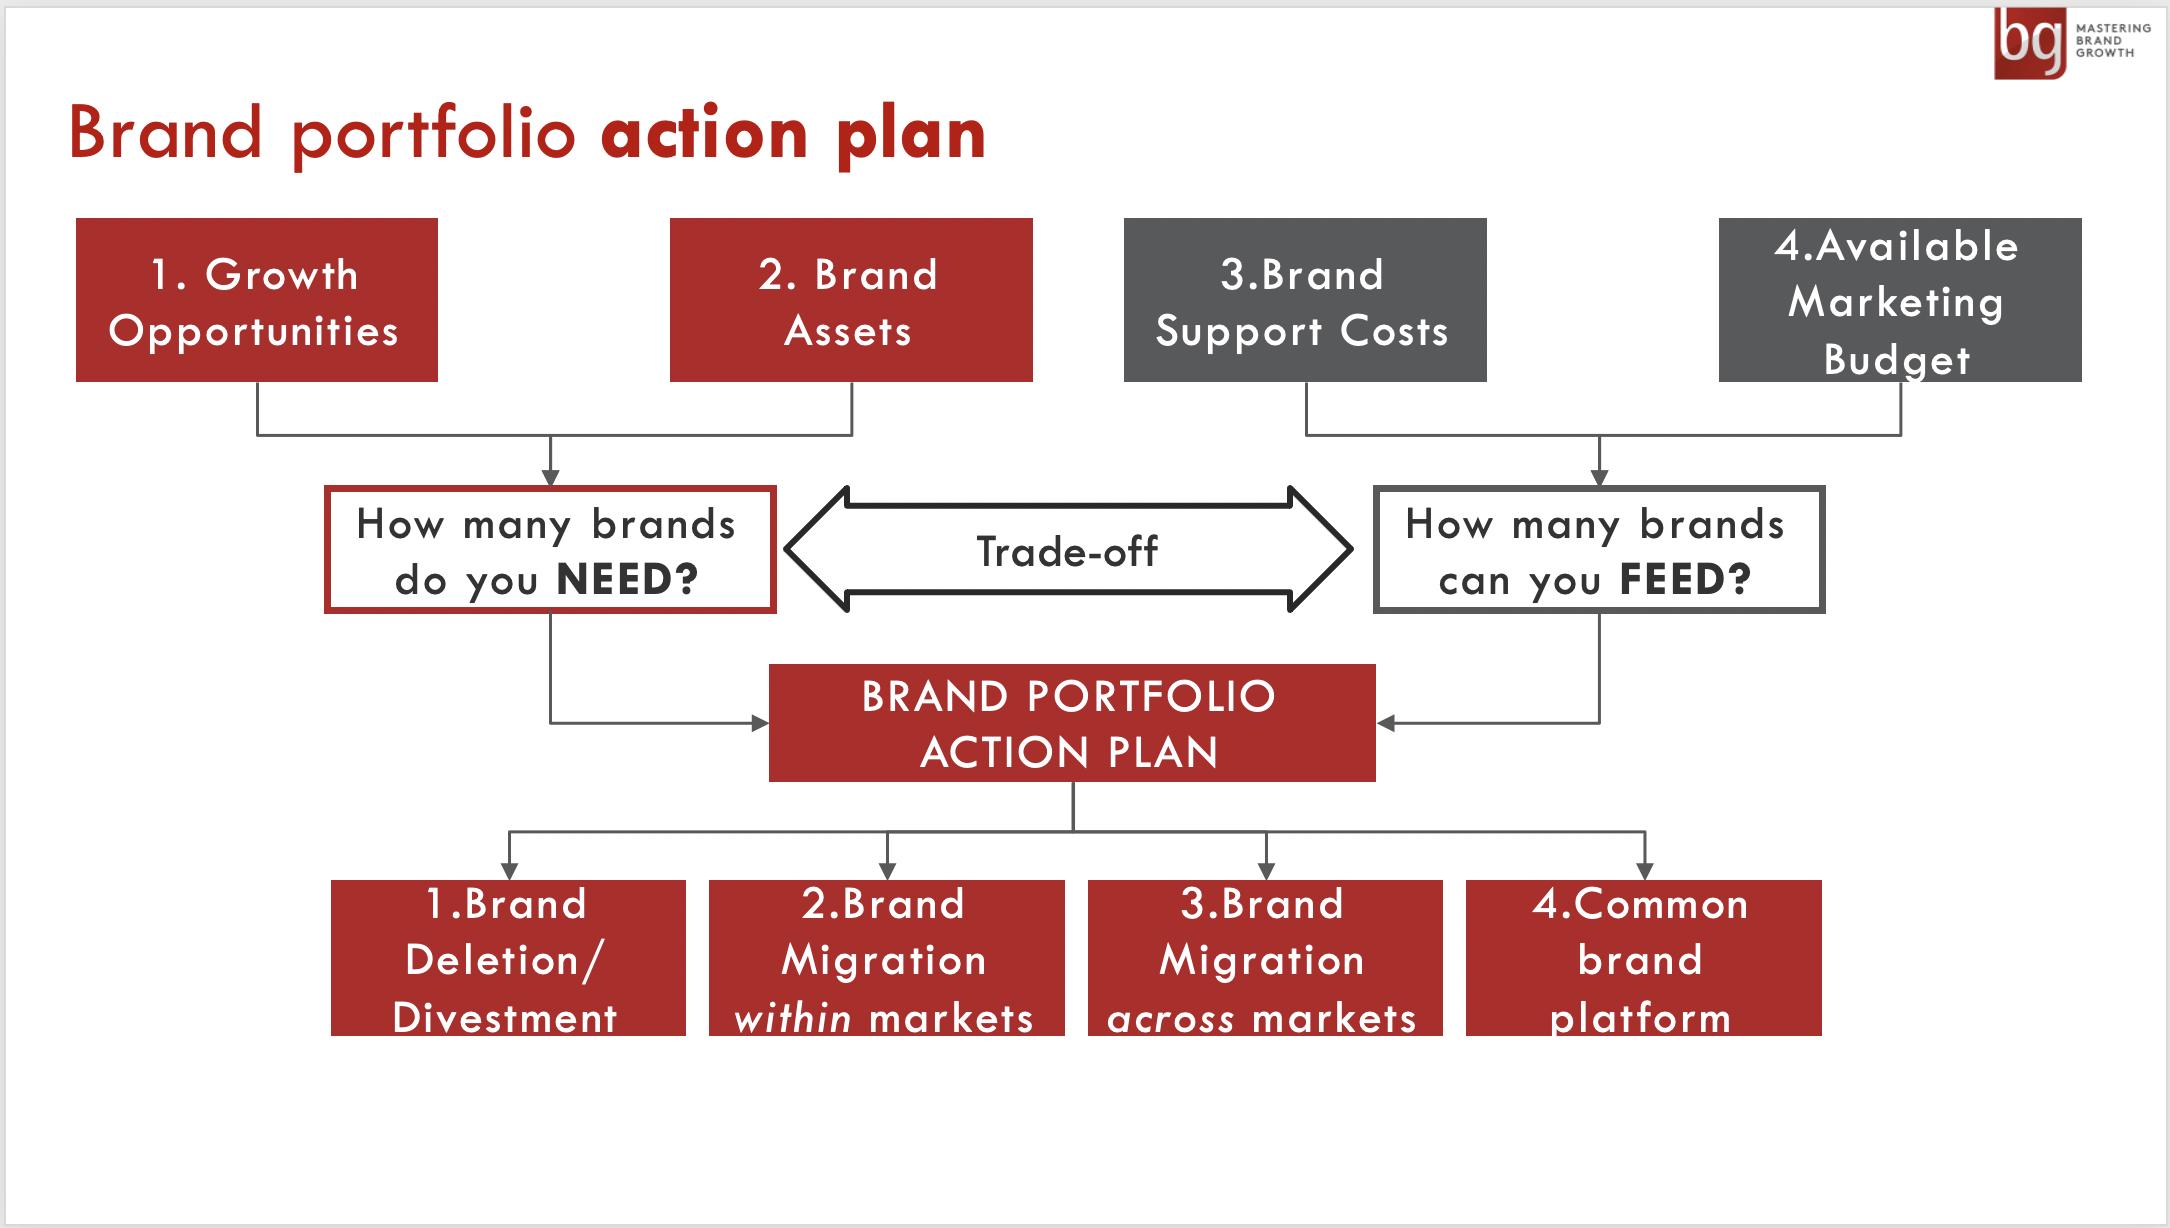 Brand portfolio action plan